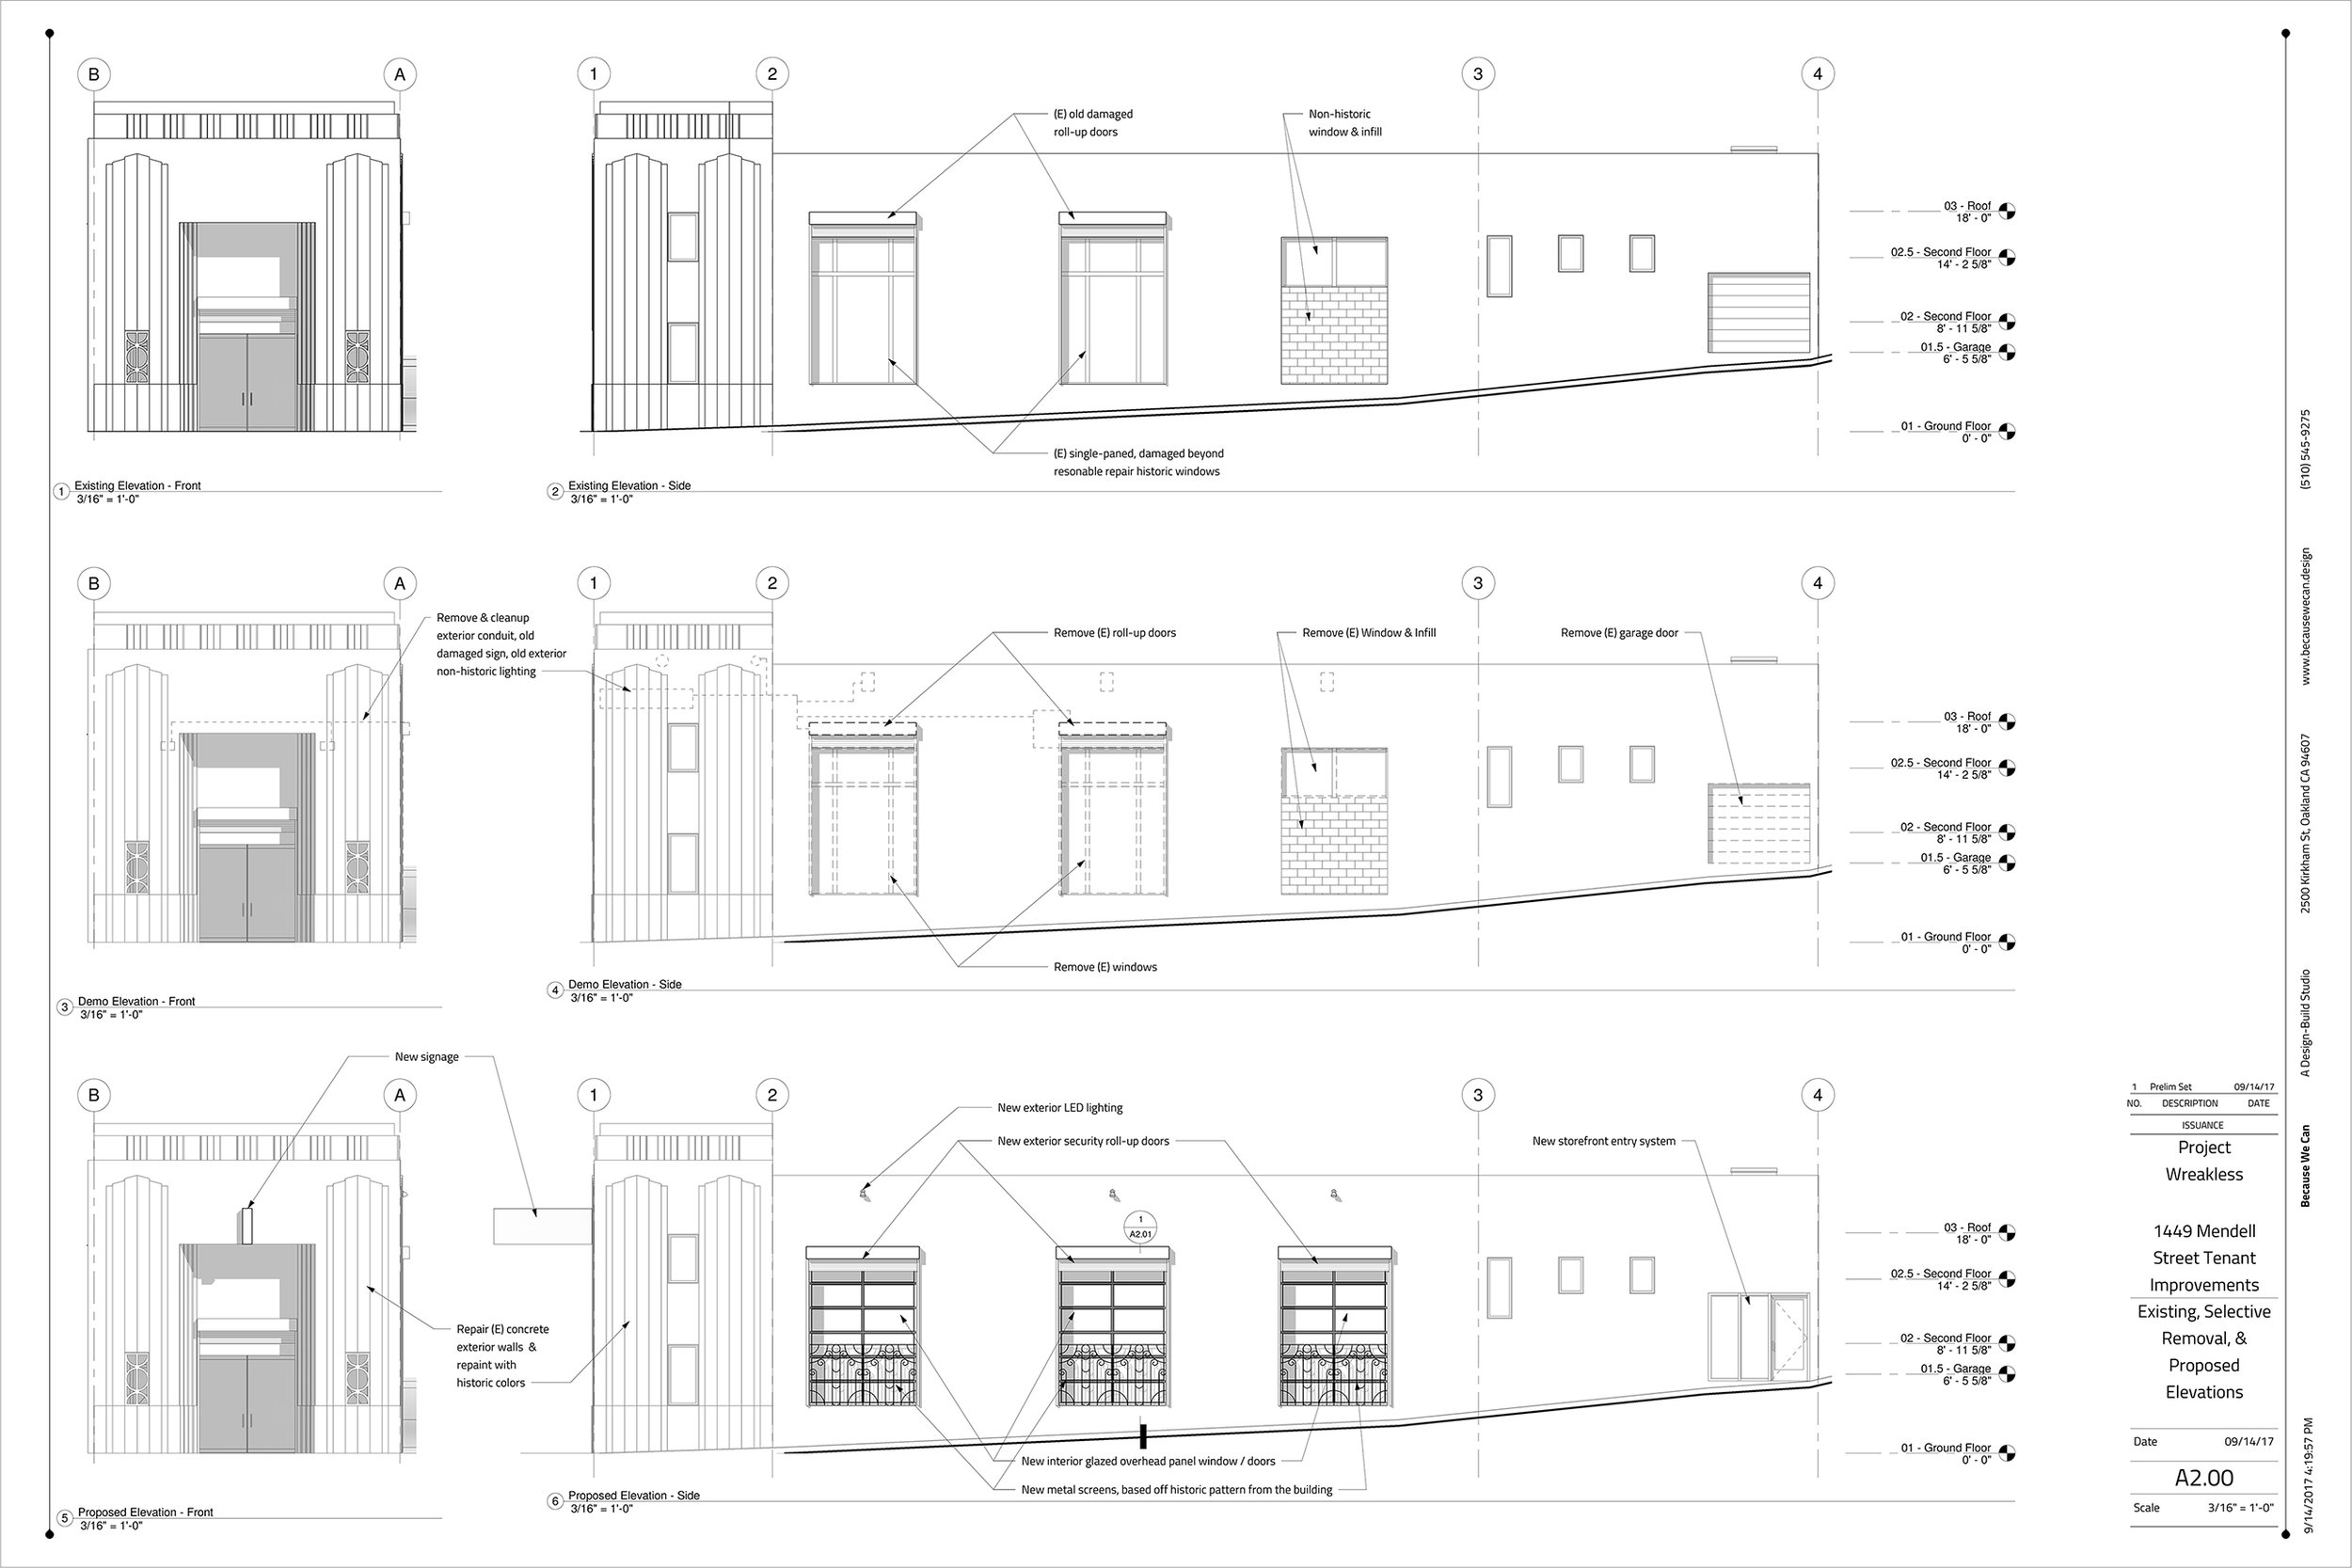 091417_1449 Mendell_Exterior Prelim Set-3.jpg